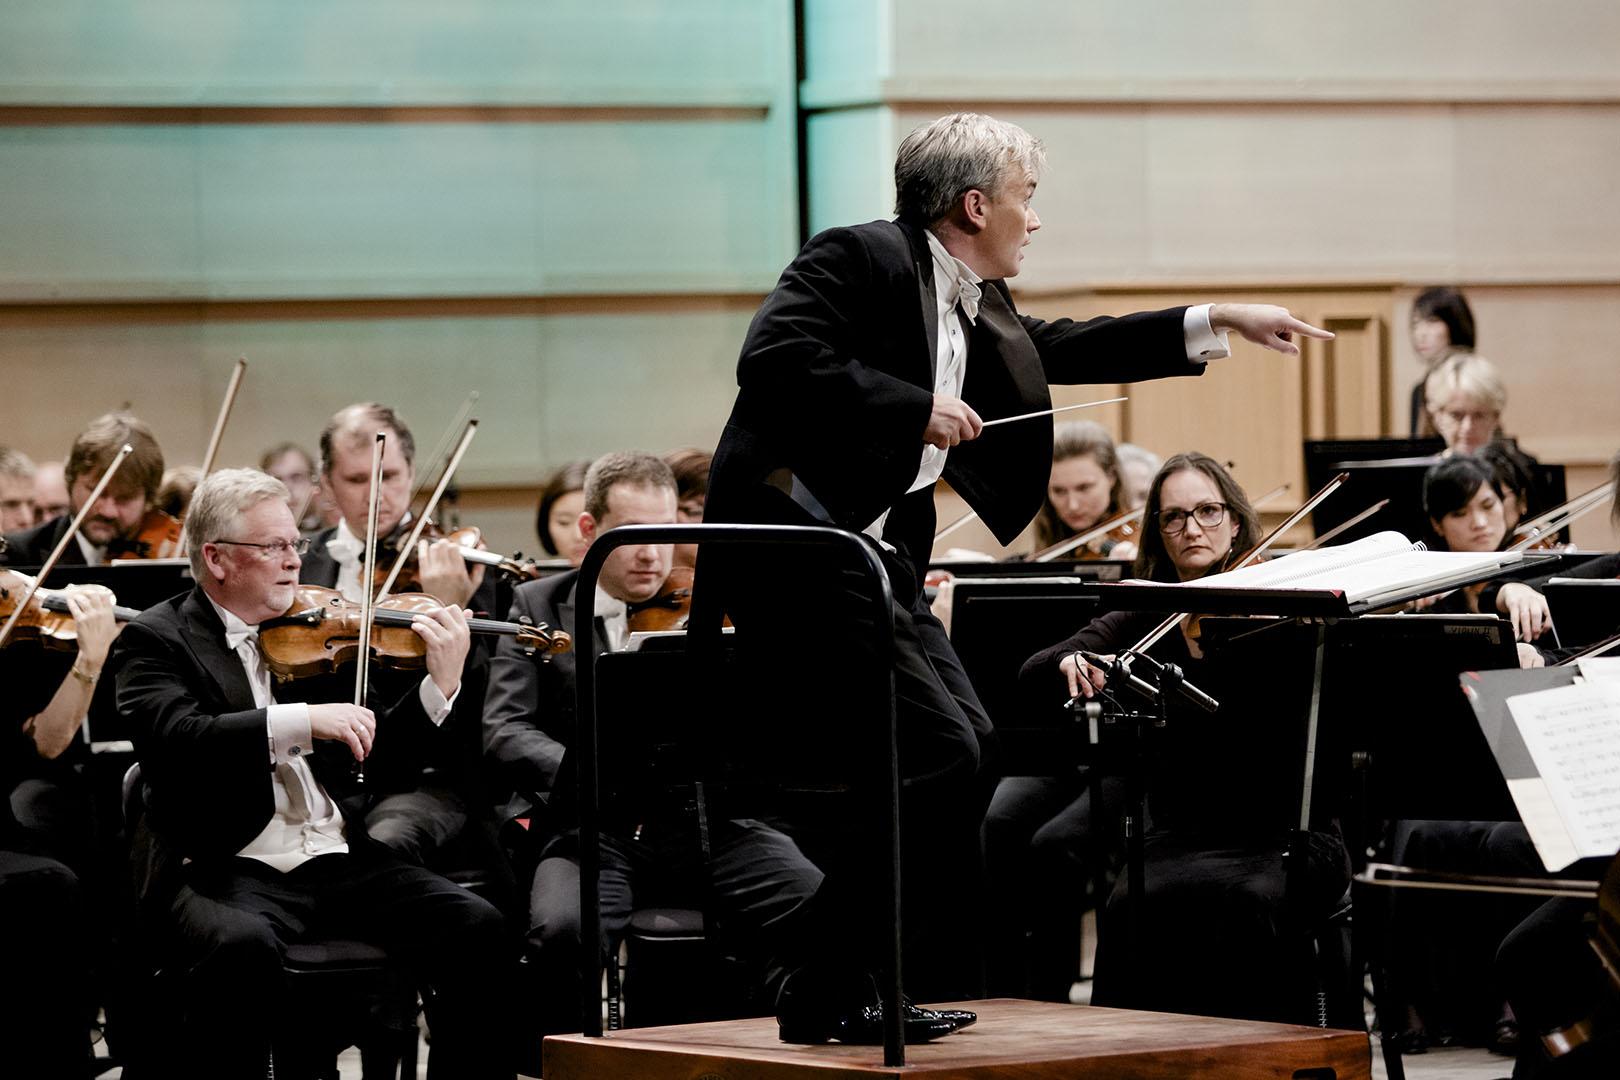 Bergen Philharmonic Orchestra Jubileumsgalla Bergen 20151008: Bergen Filharmoniske Orkester markerte 250-årsjubileumet med gallakonsert i Grieghallen. FOTO: PAUL S. AMUNDSEN